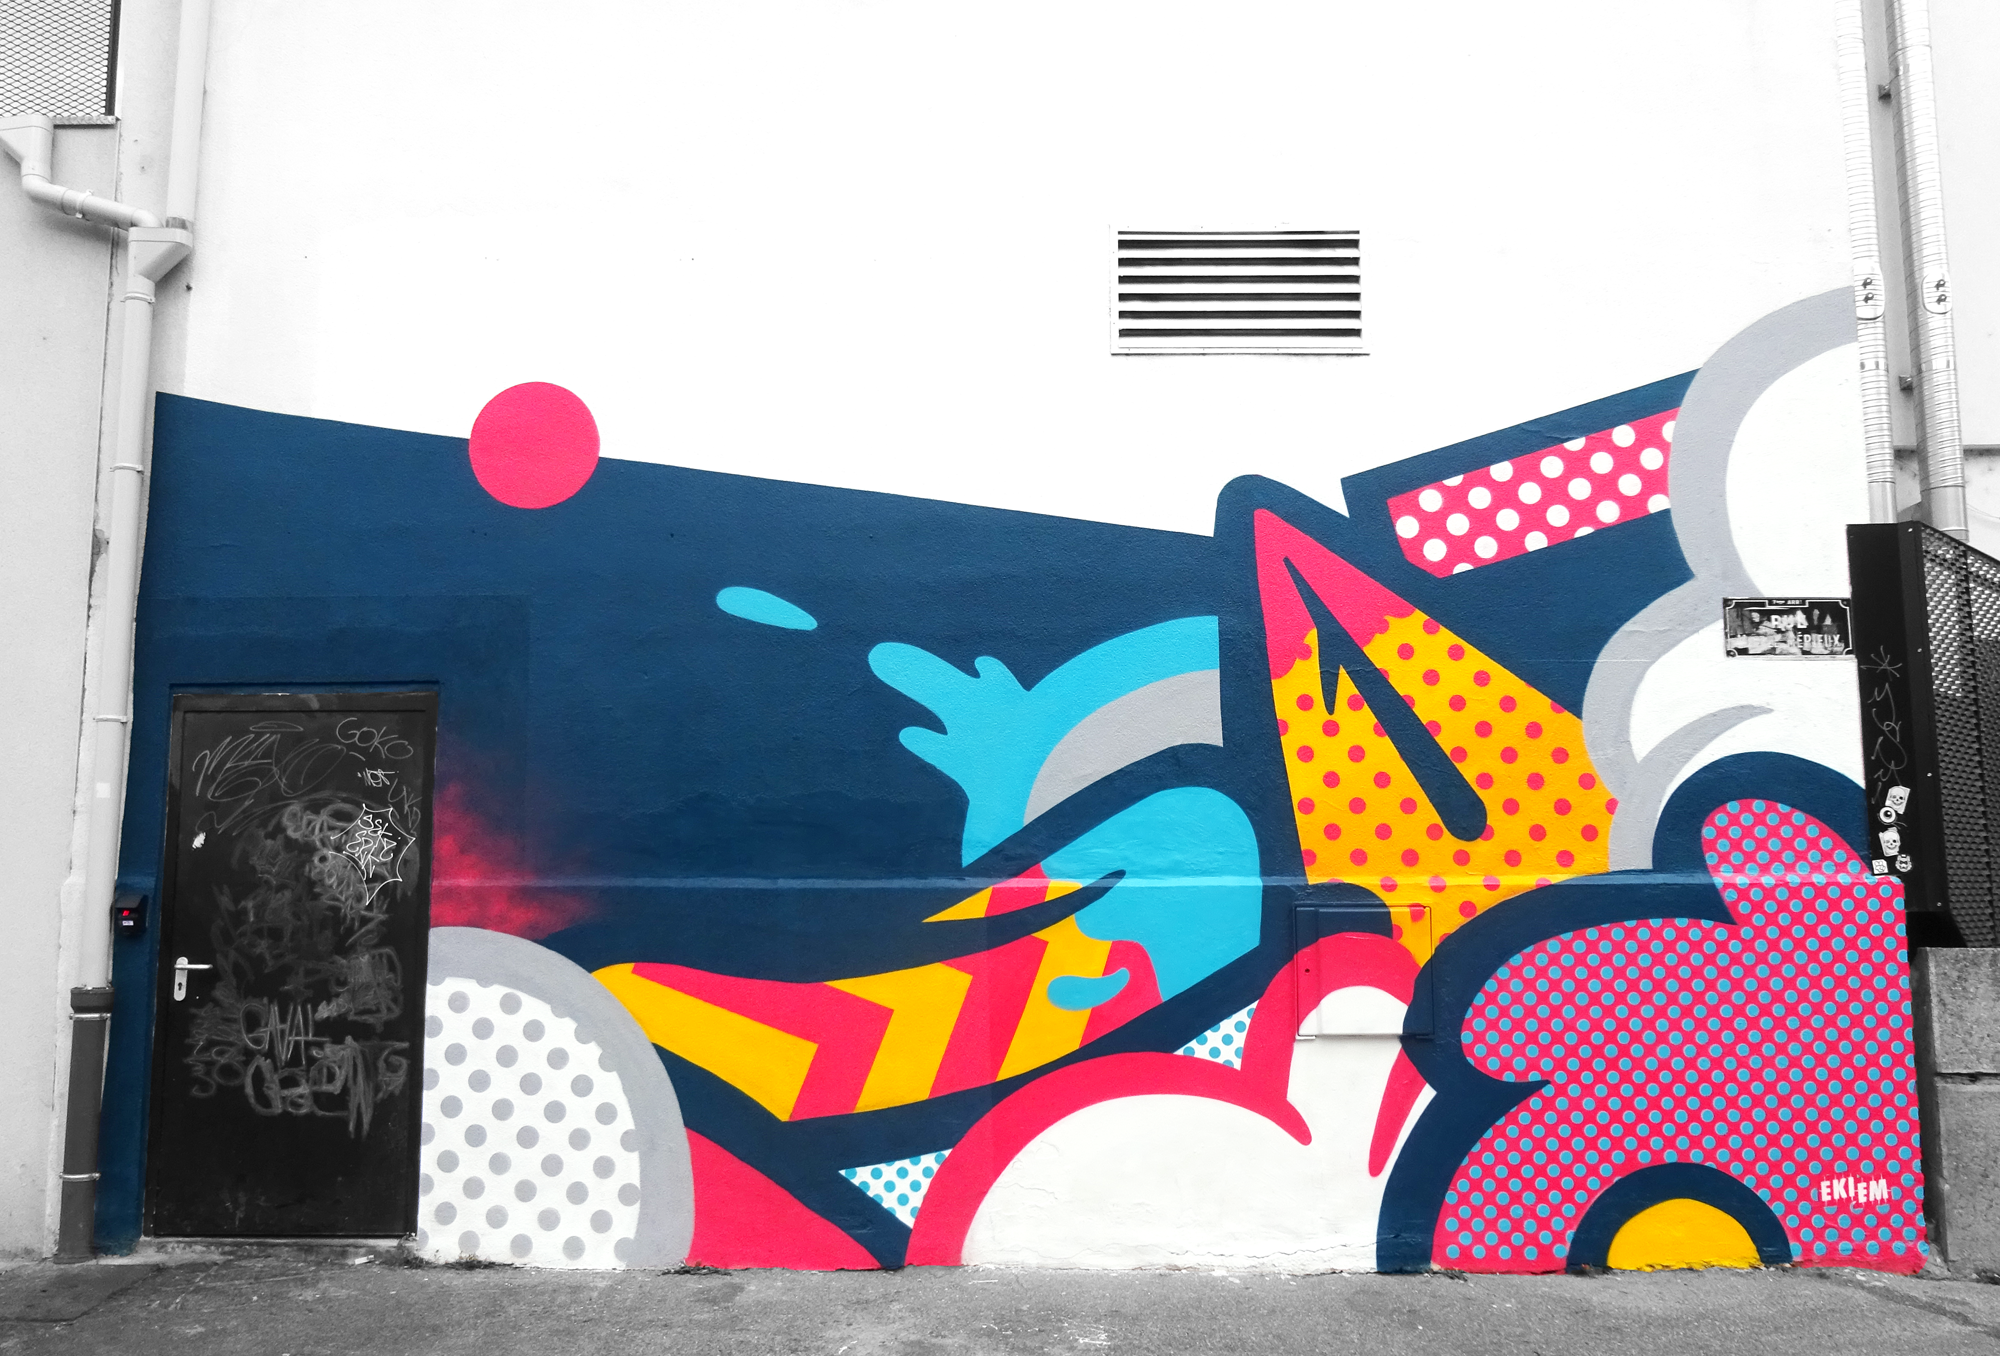 ninkasi_seasoninhell_ekiem_artist_serie_wall_painting_peinturefraichefestivale.png